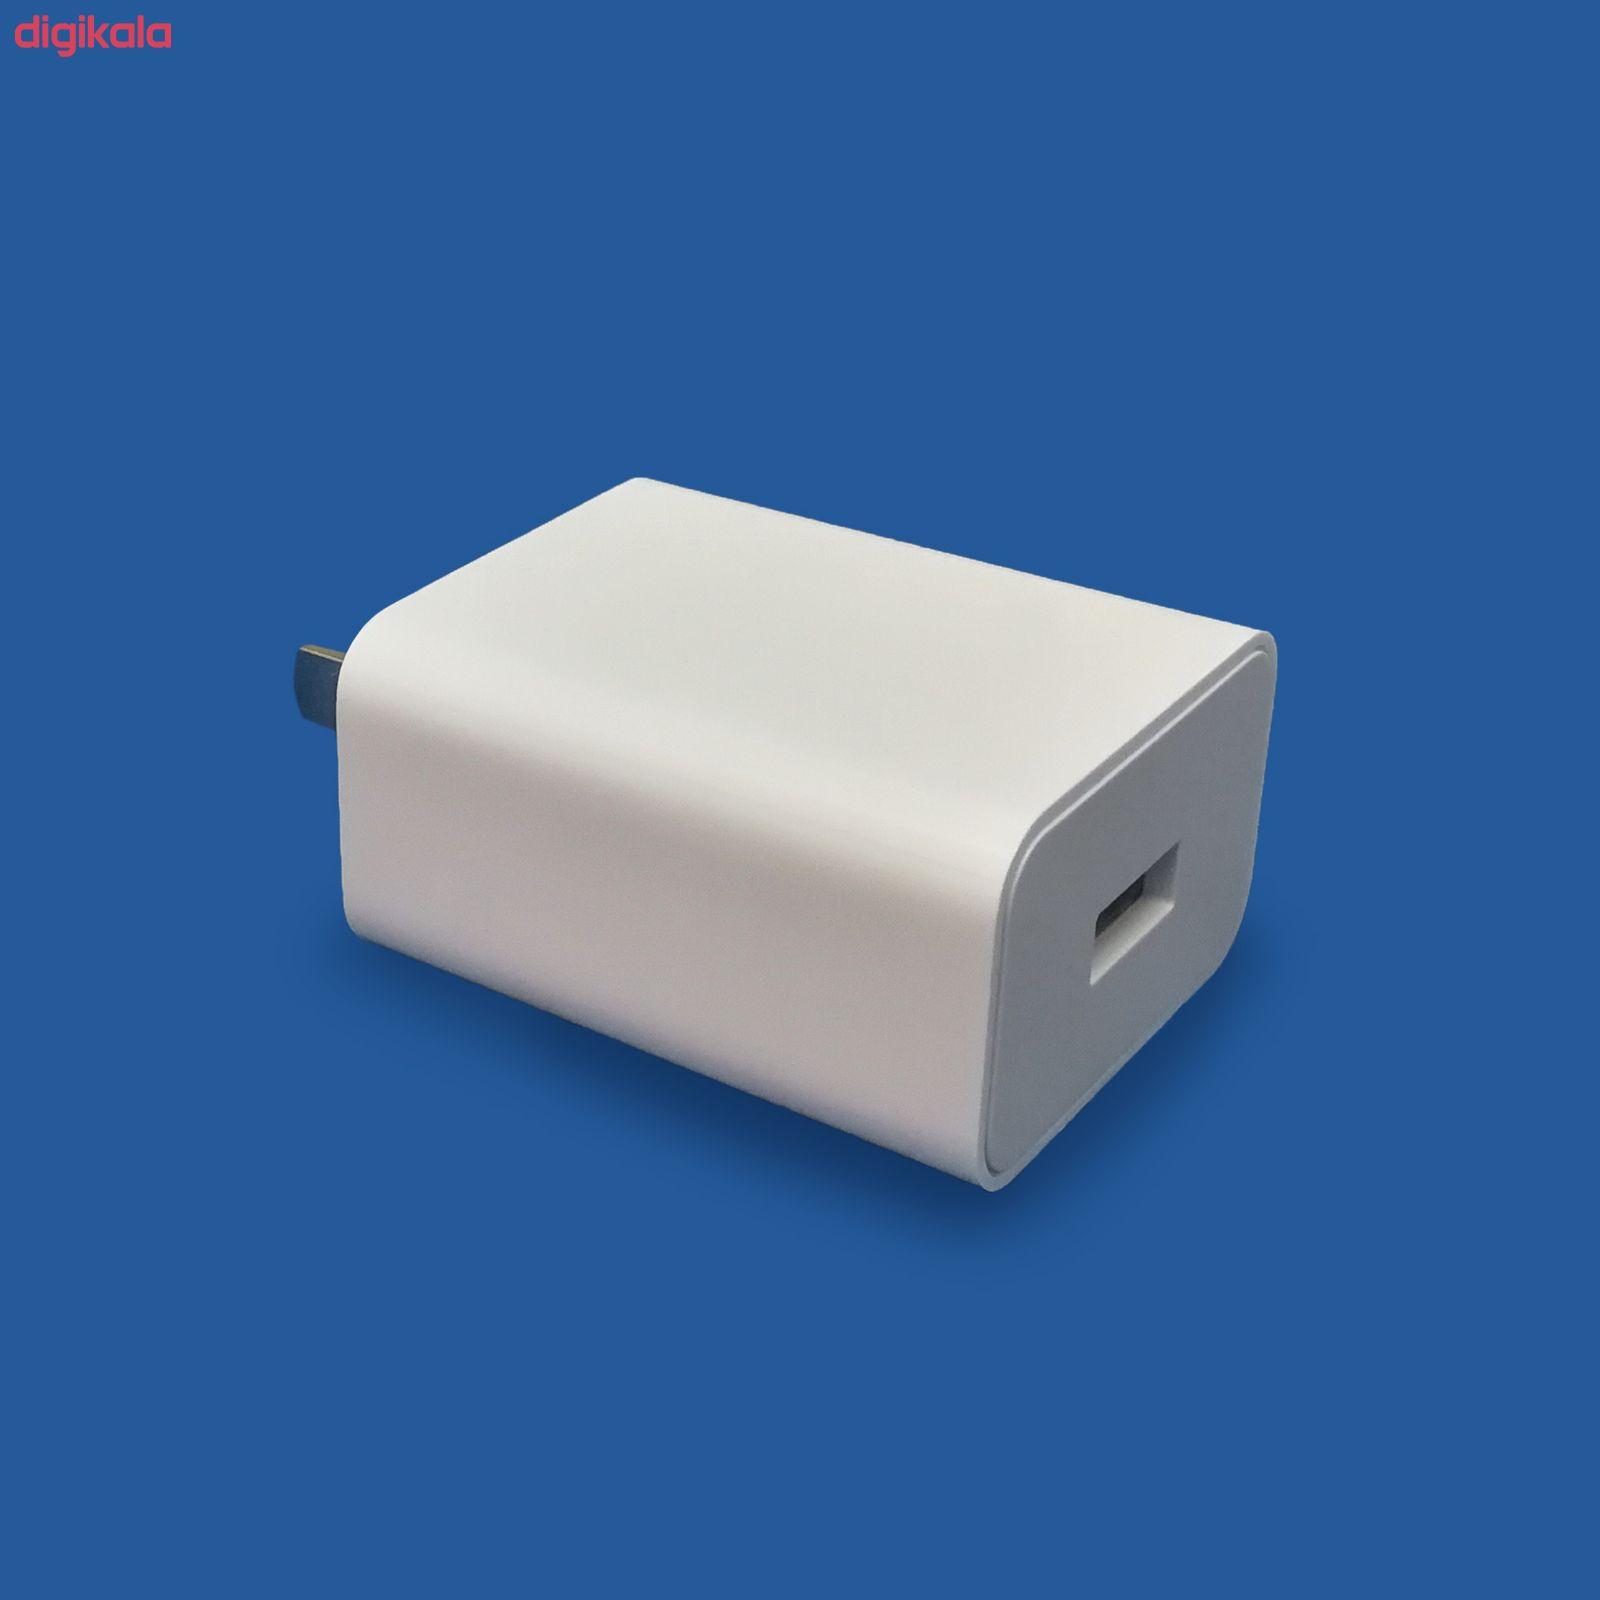 شارژر دیواری شیائومی مدل MDY-10-EC به همراه کابل تبدیل USB-C main 1 2